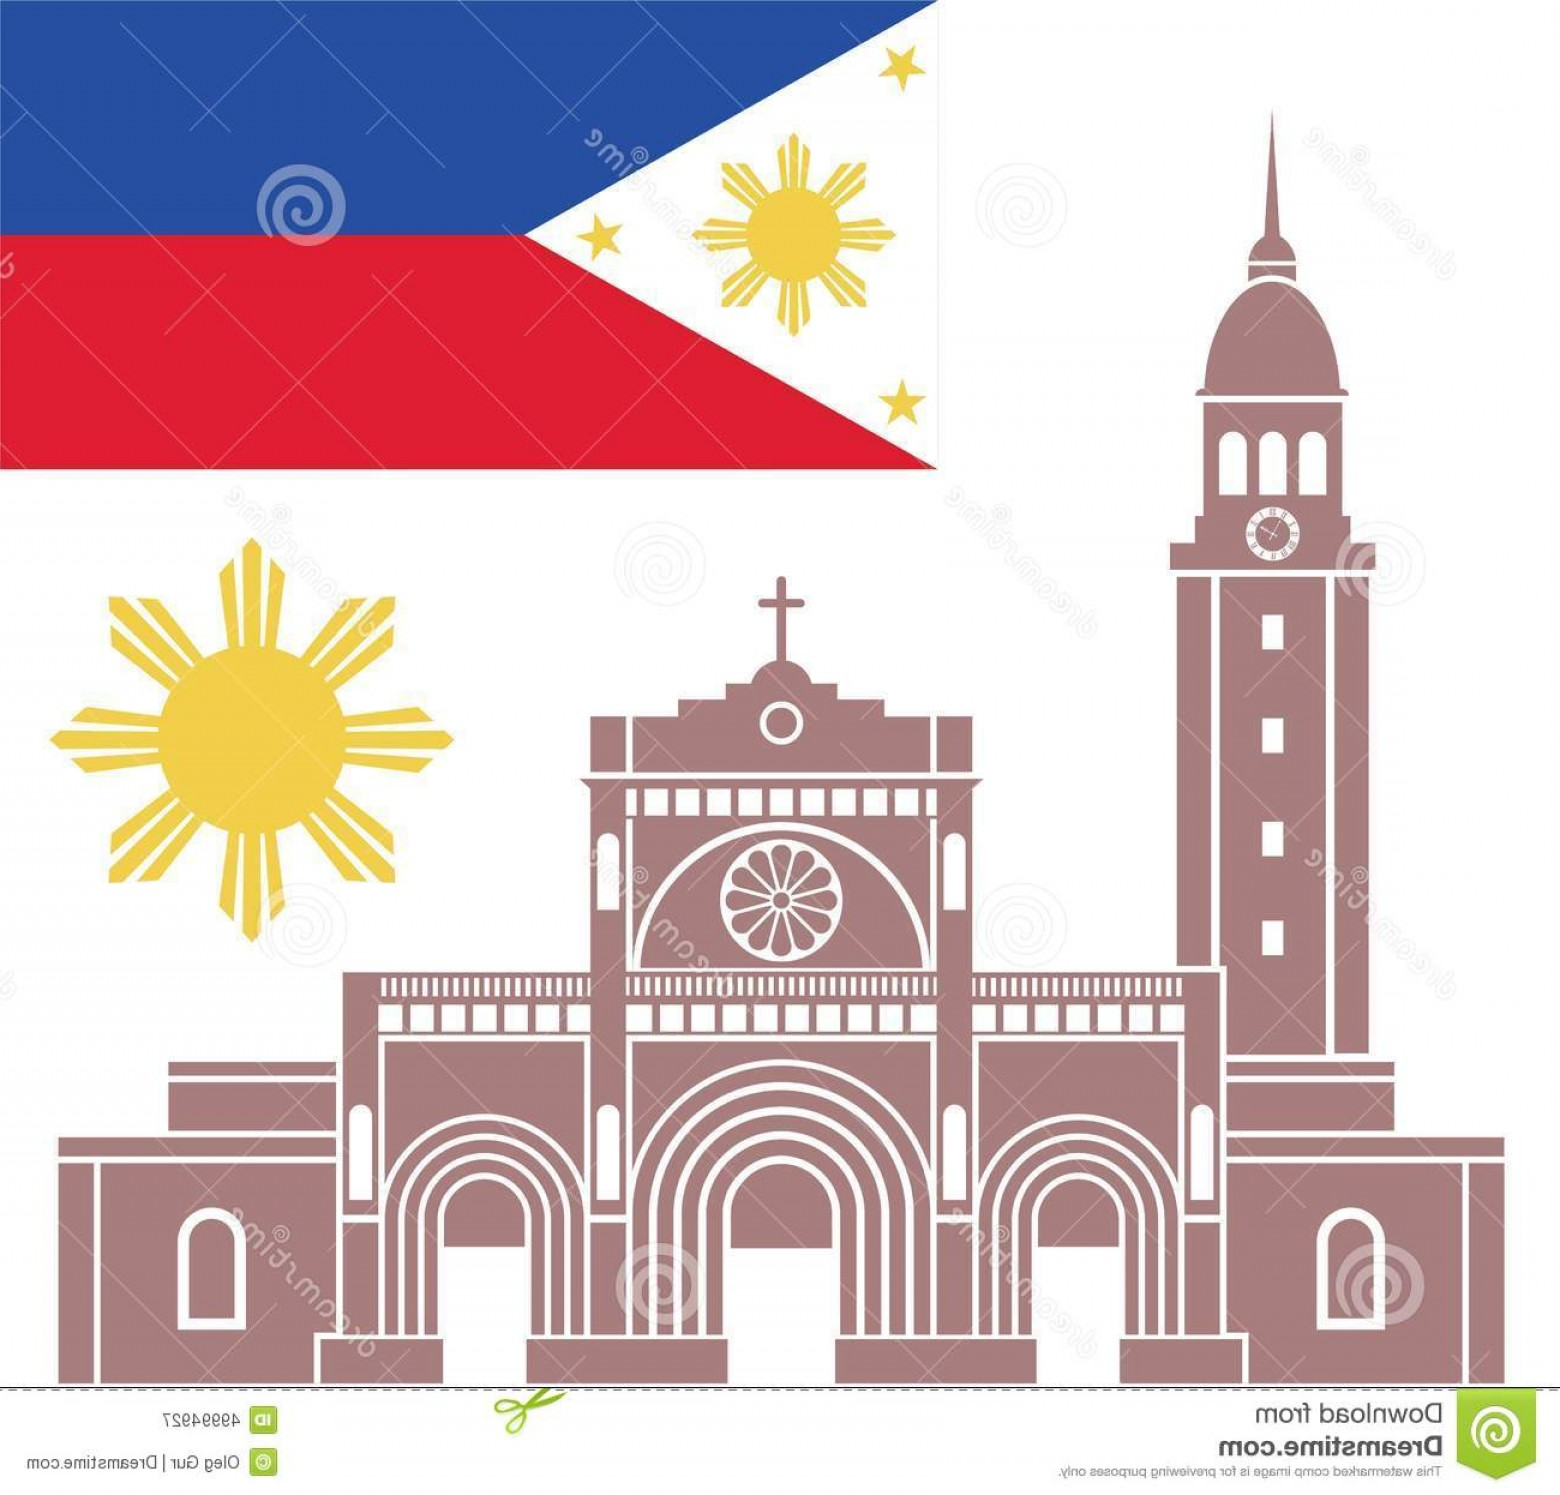 1560x1495 Stock Illustration Philippines Vector Illustration Eps Image Arenawp